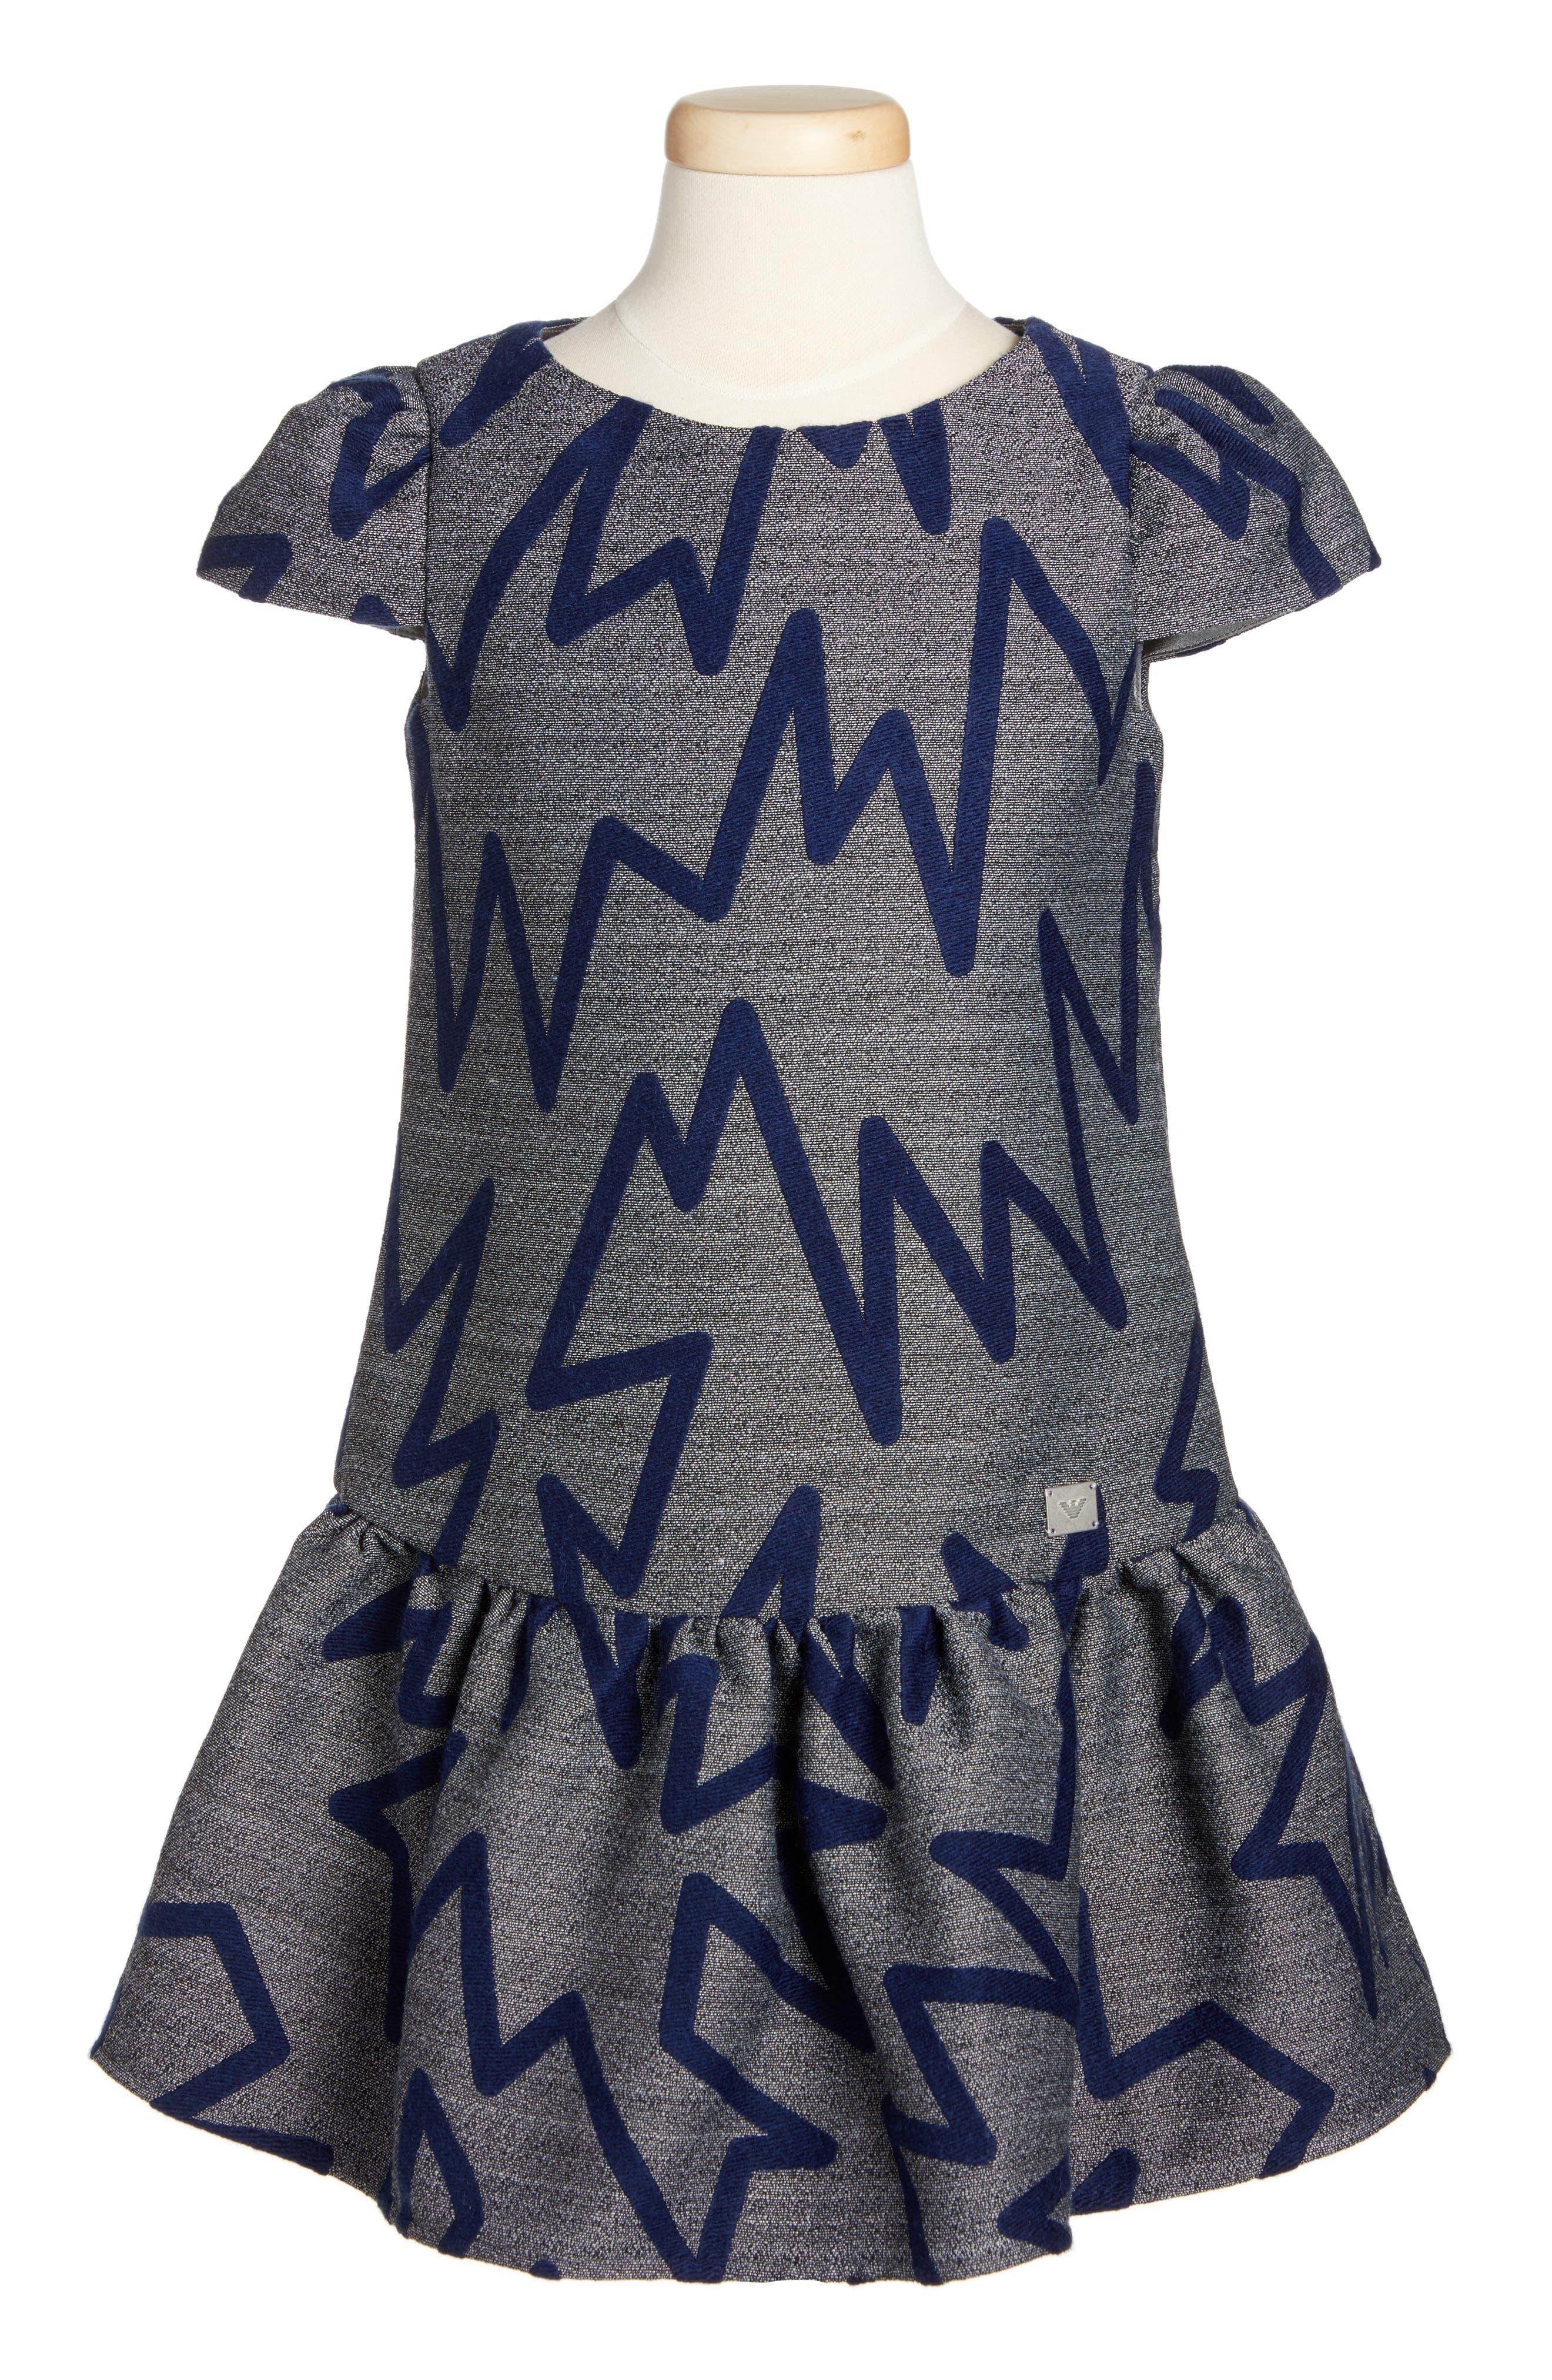 Alternate Image 1 Selected - Armani Junior Zig Zag Drop Waist Dress (Big Girls)